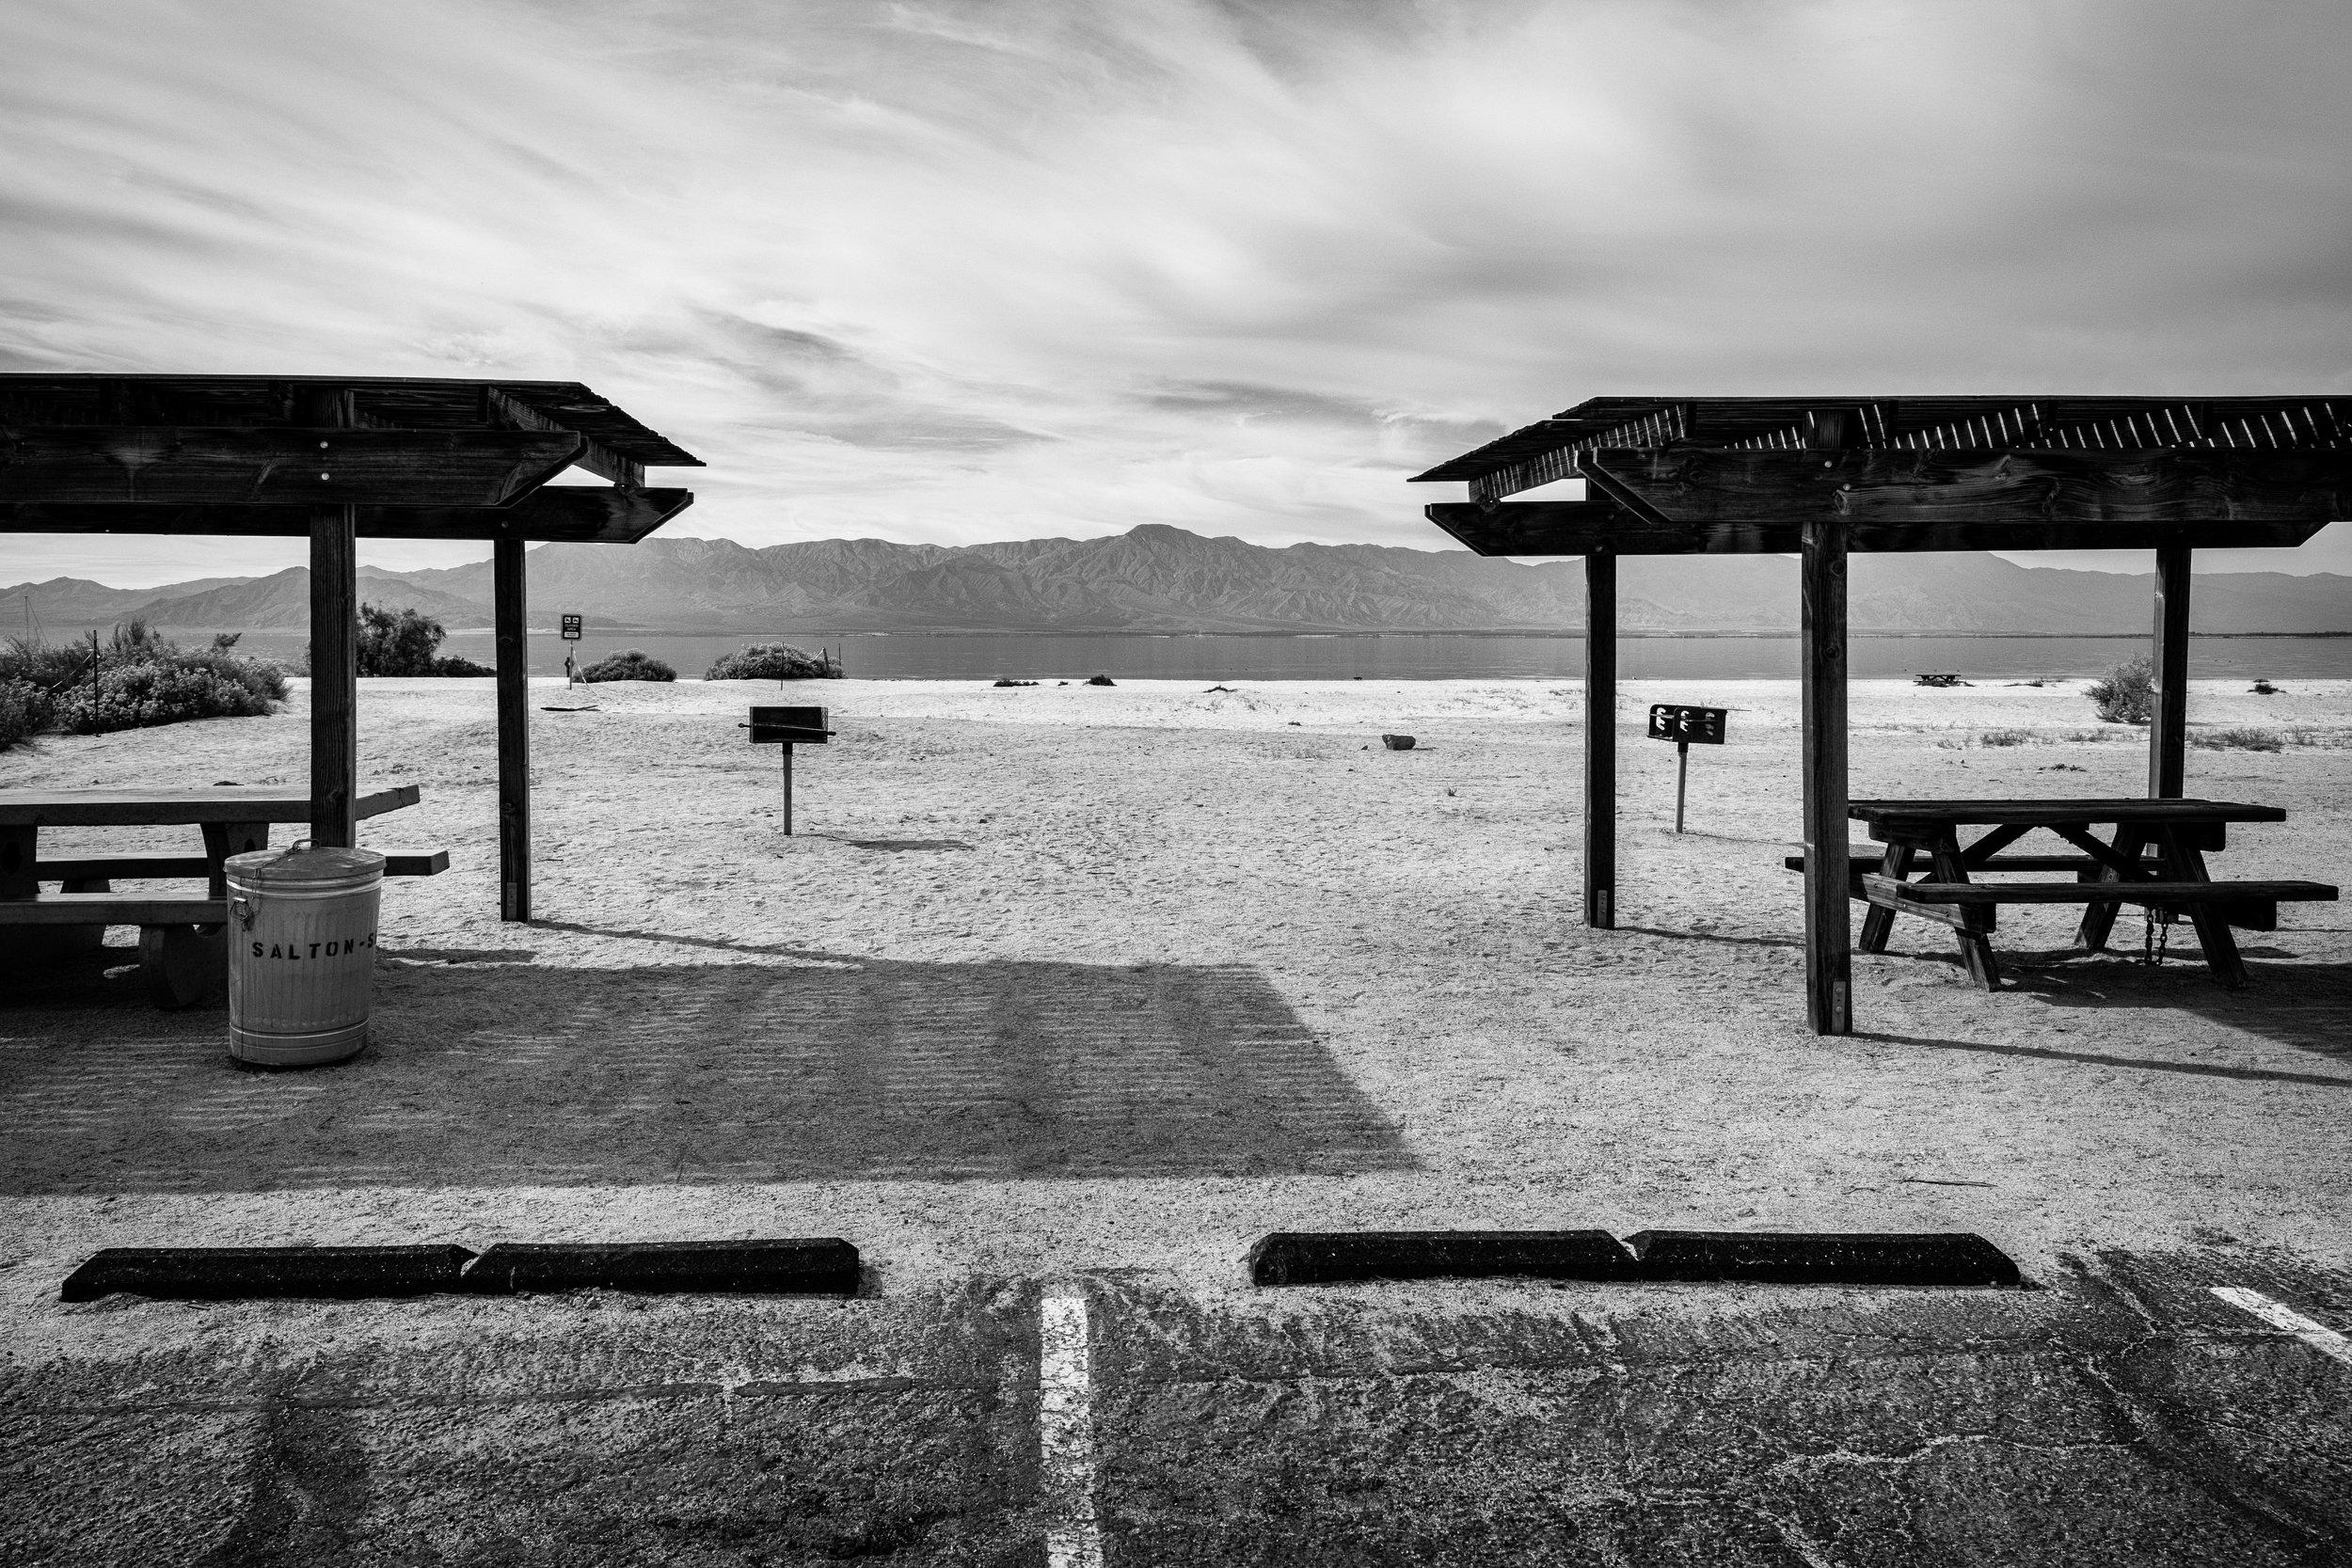 Salton Sea State Recreation Area. 1/640 @ f8, ISO 200.